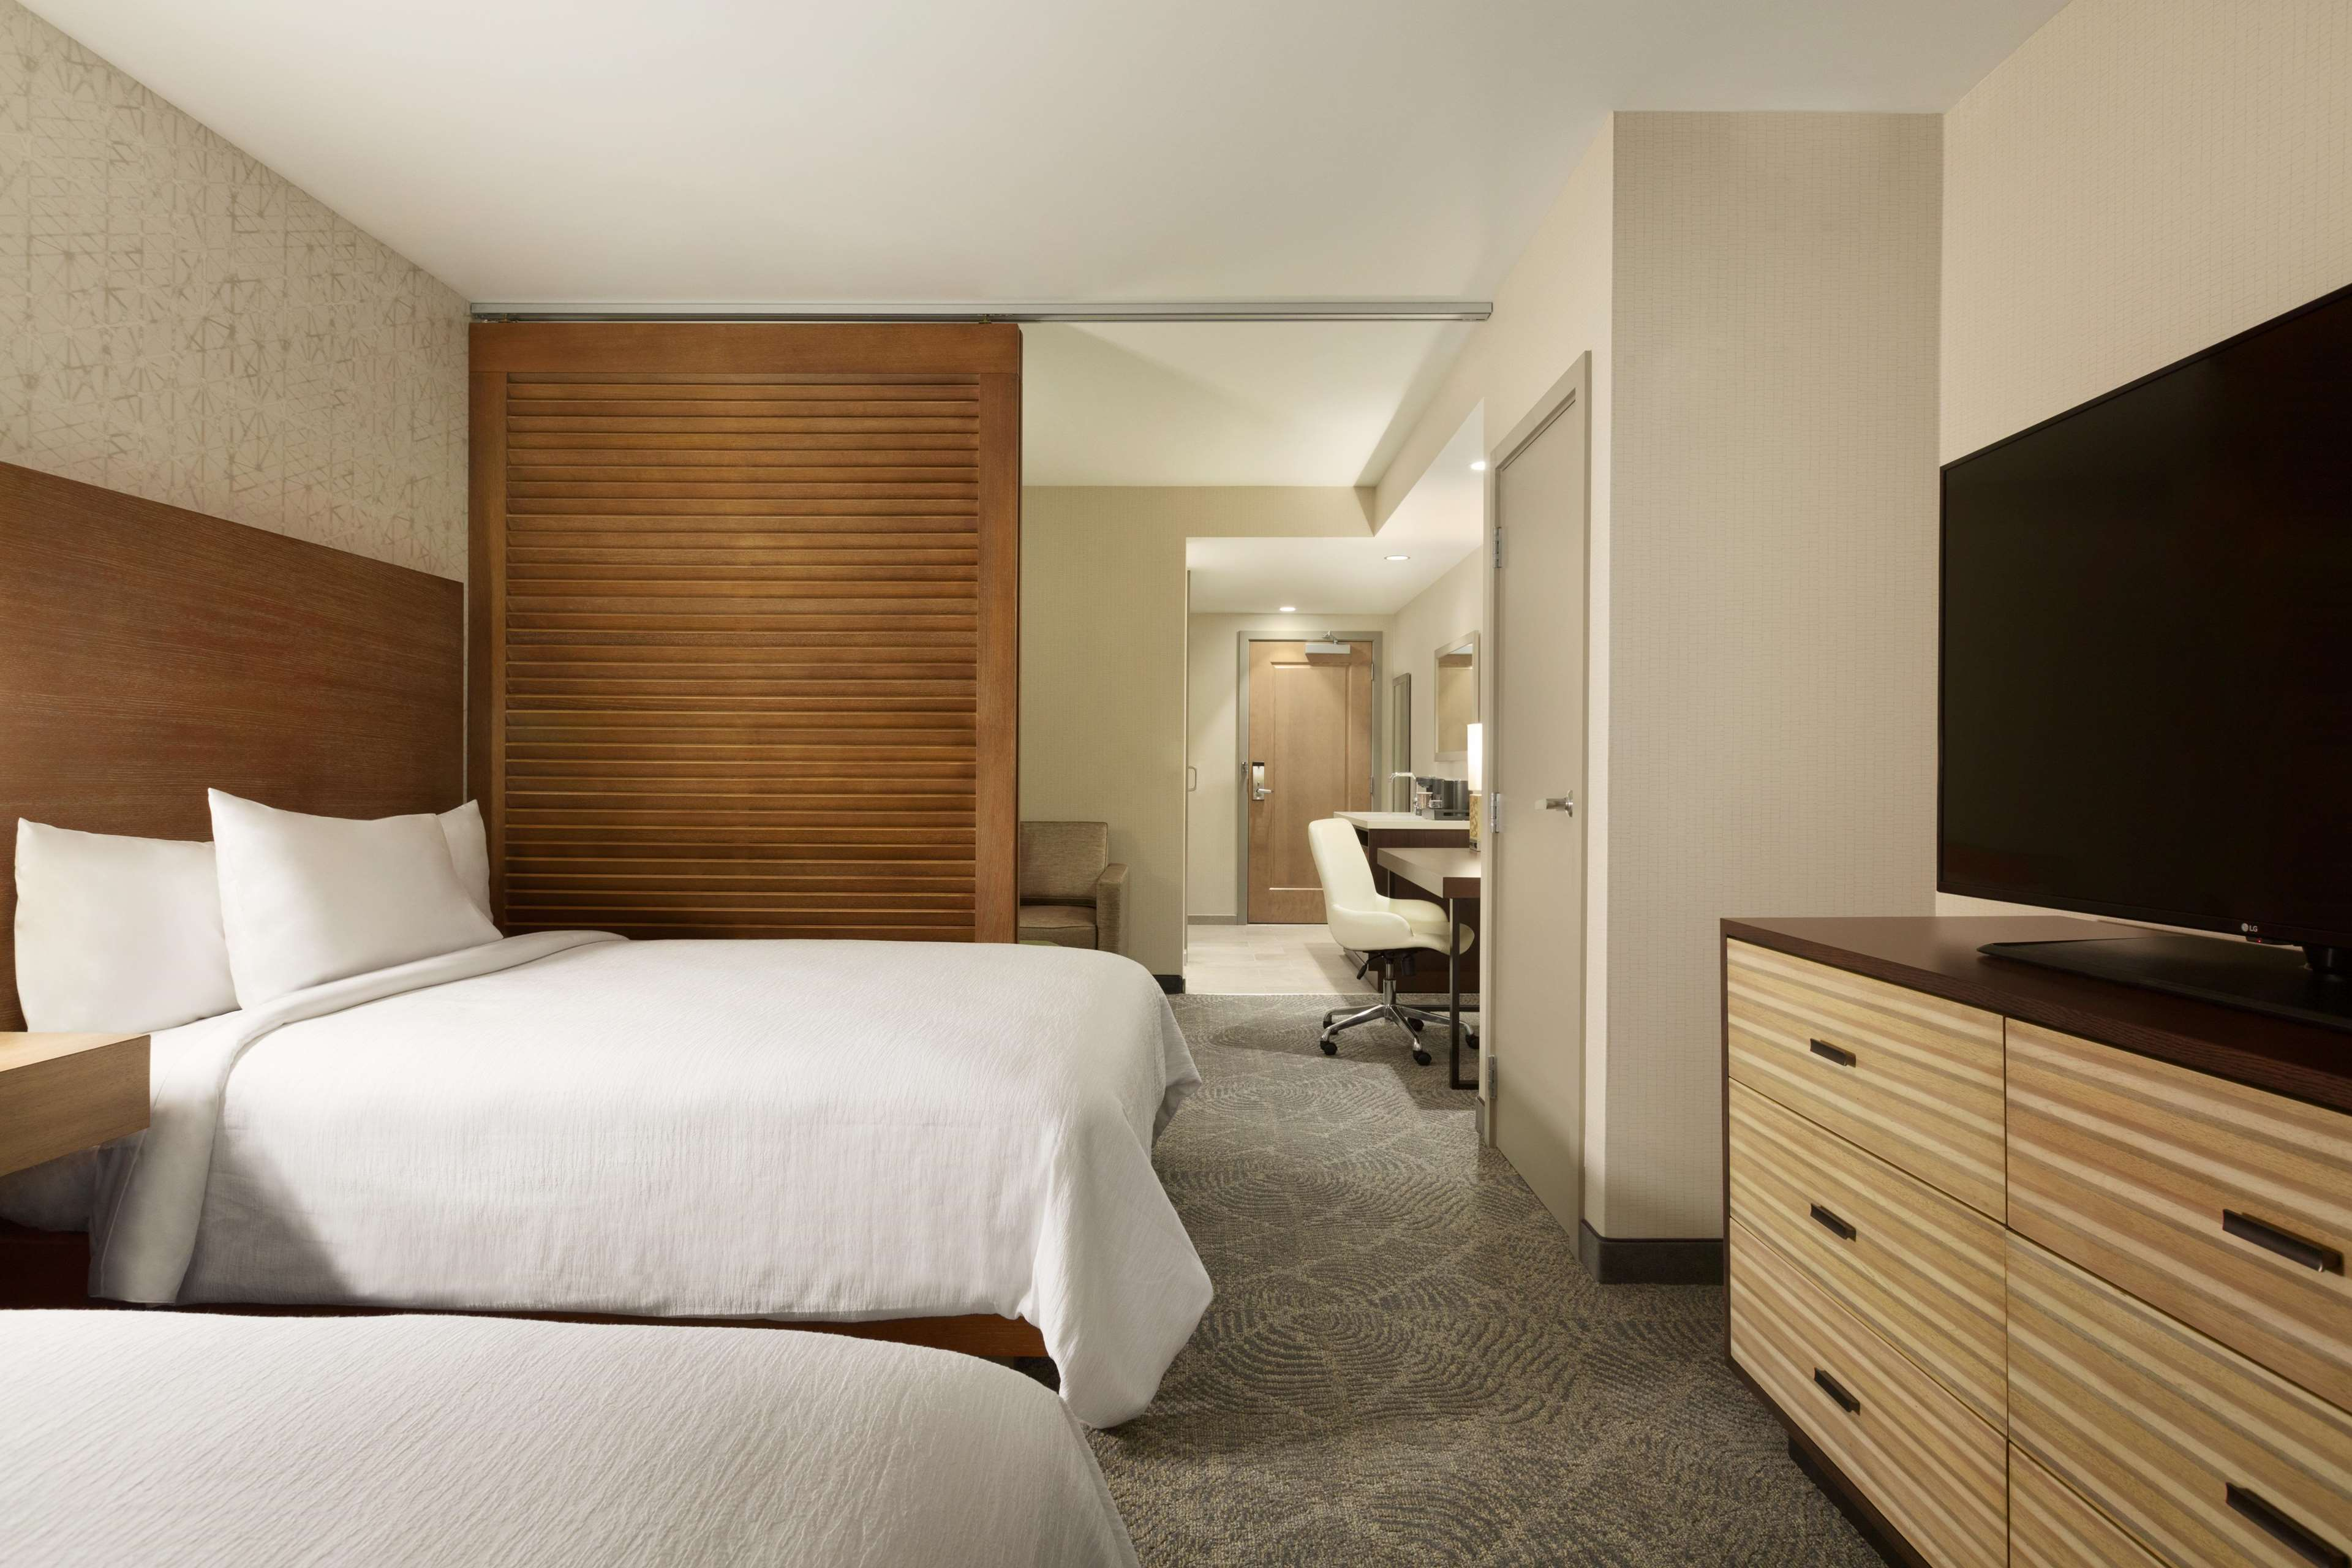 Embassy Suites by Hilton Oahu Kapolei image 32